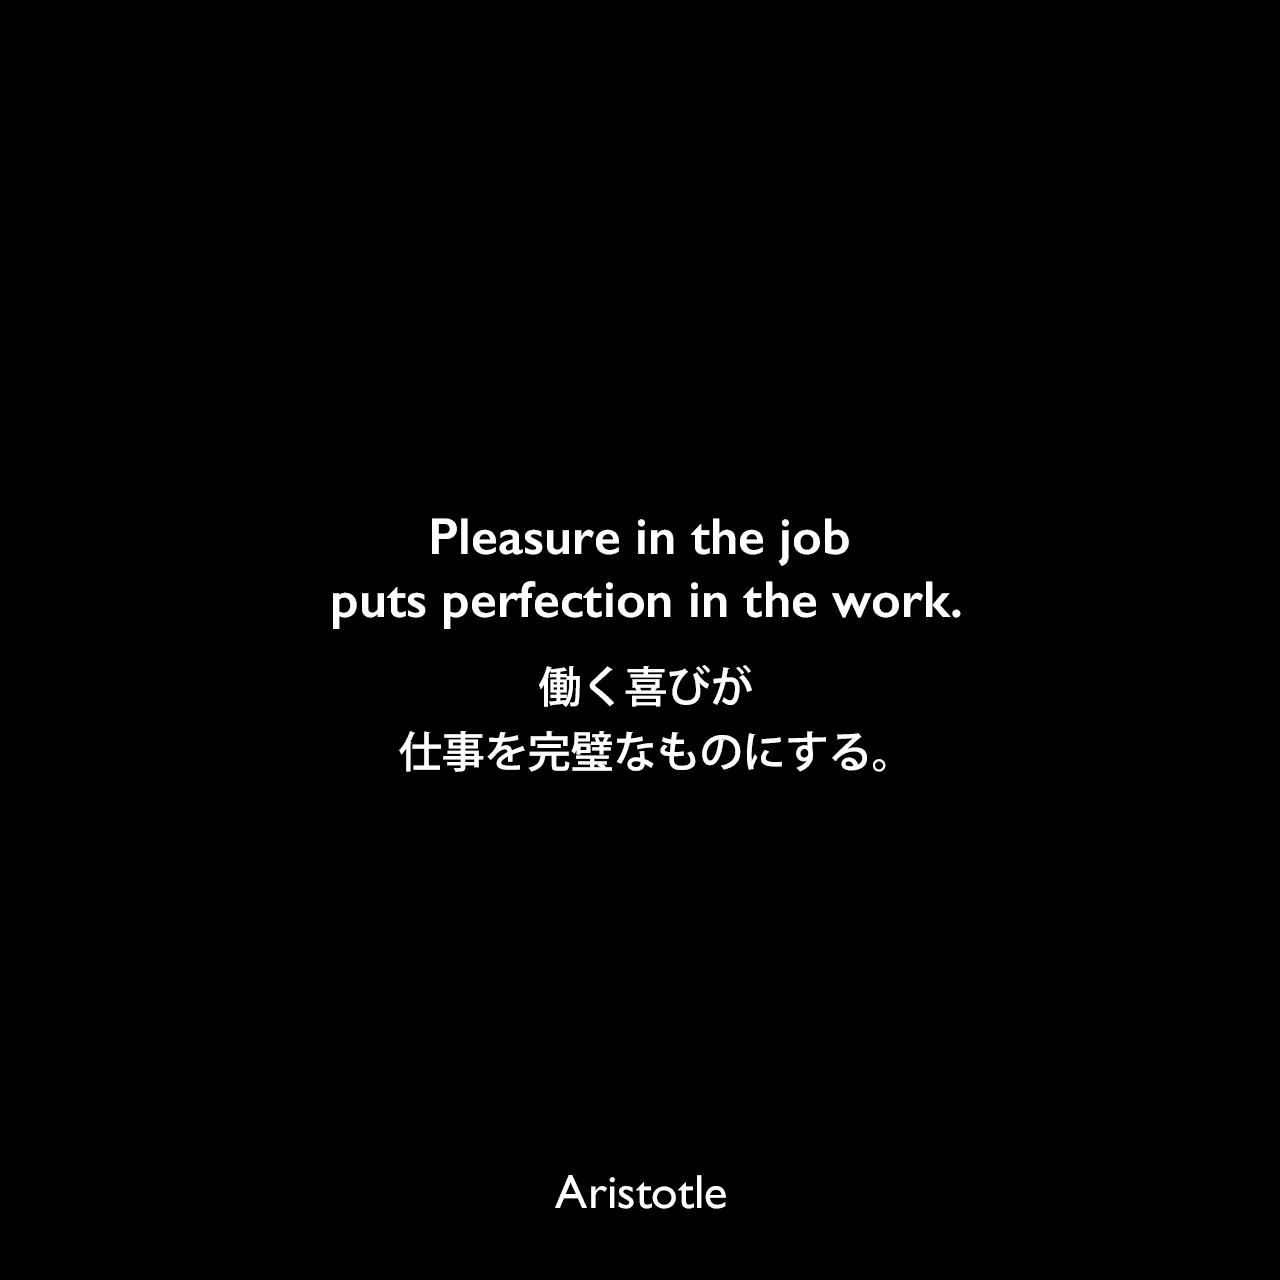 Pleasure in the job puts perfection in the work.働く喜びが仕事を完璧なものにする。Aristotle